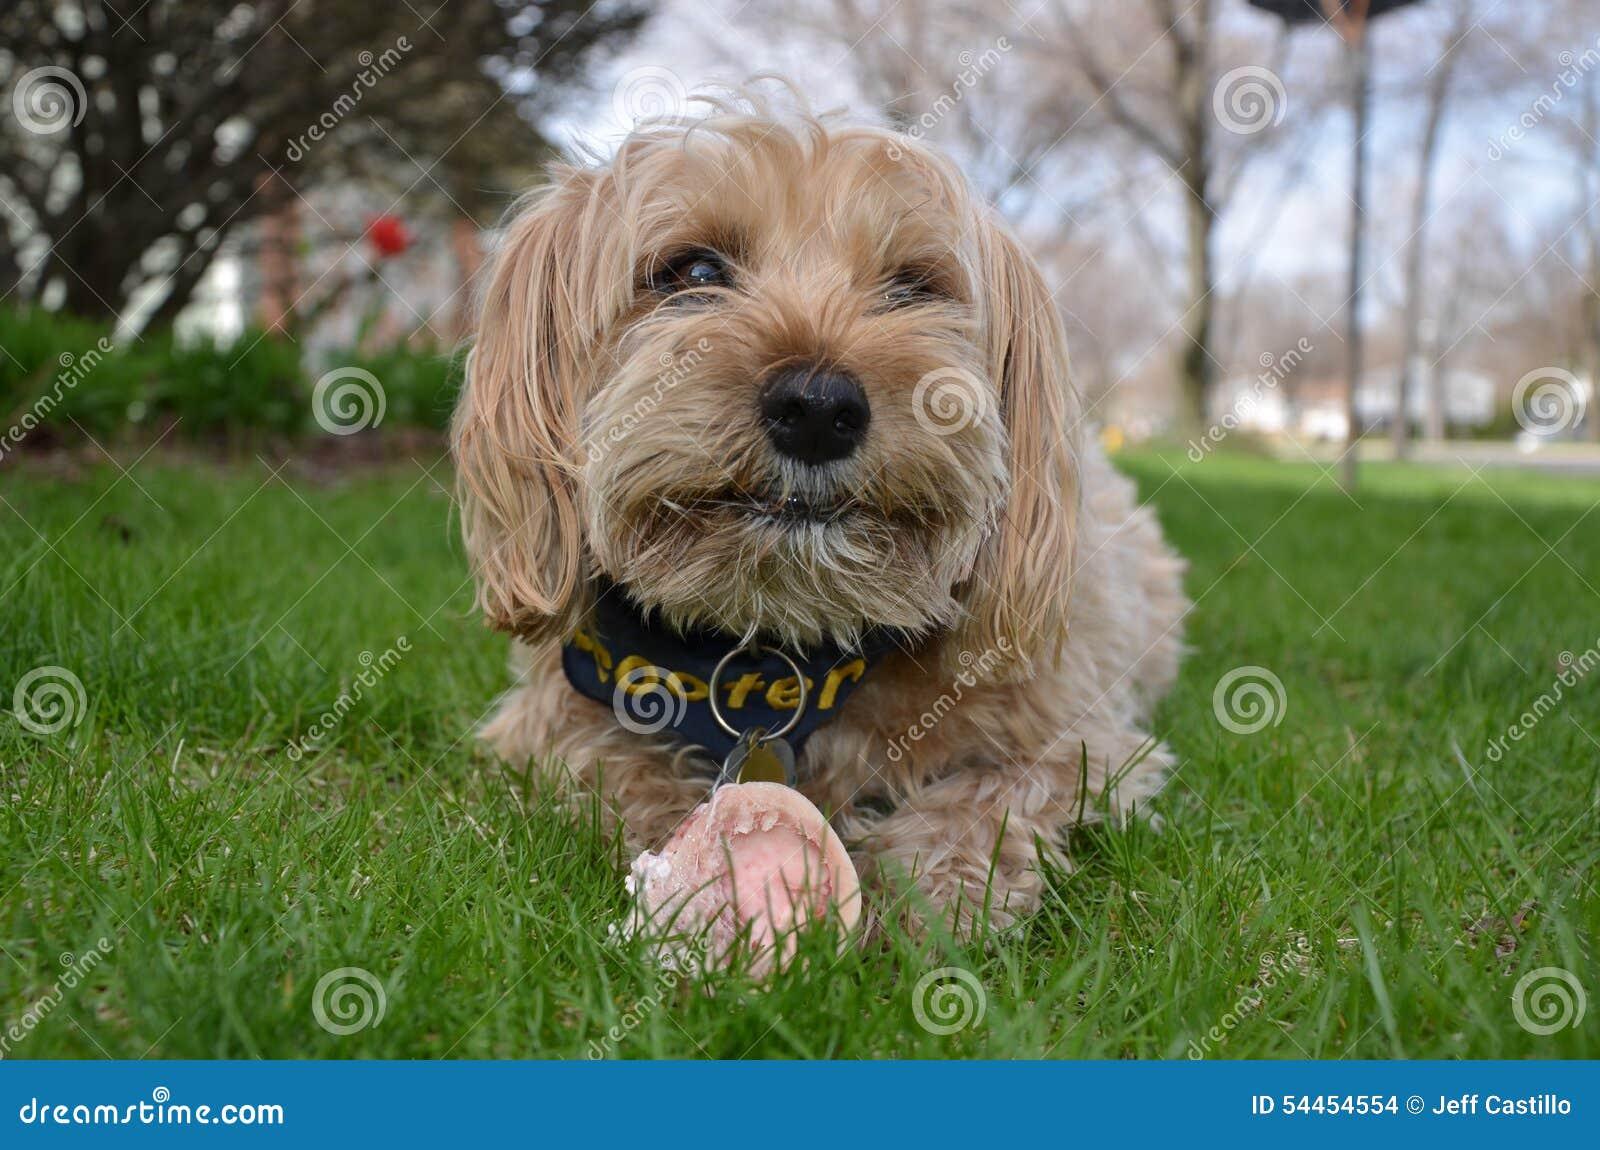 Cute Yorkipoo with bone in grass